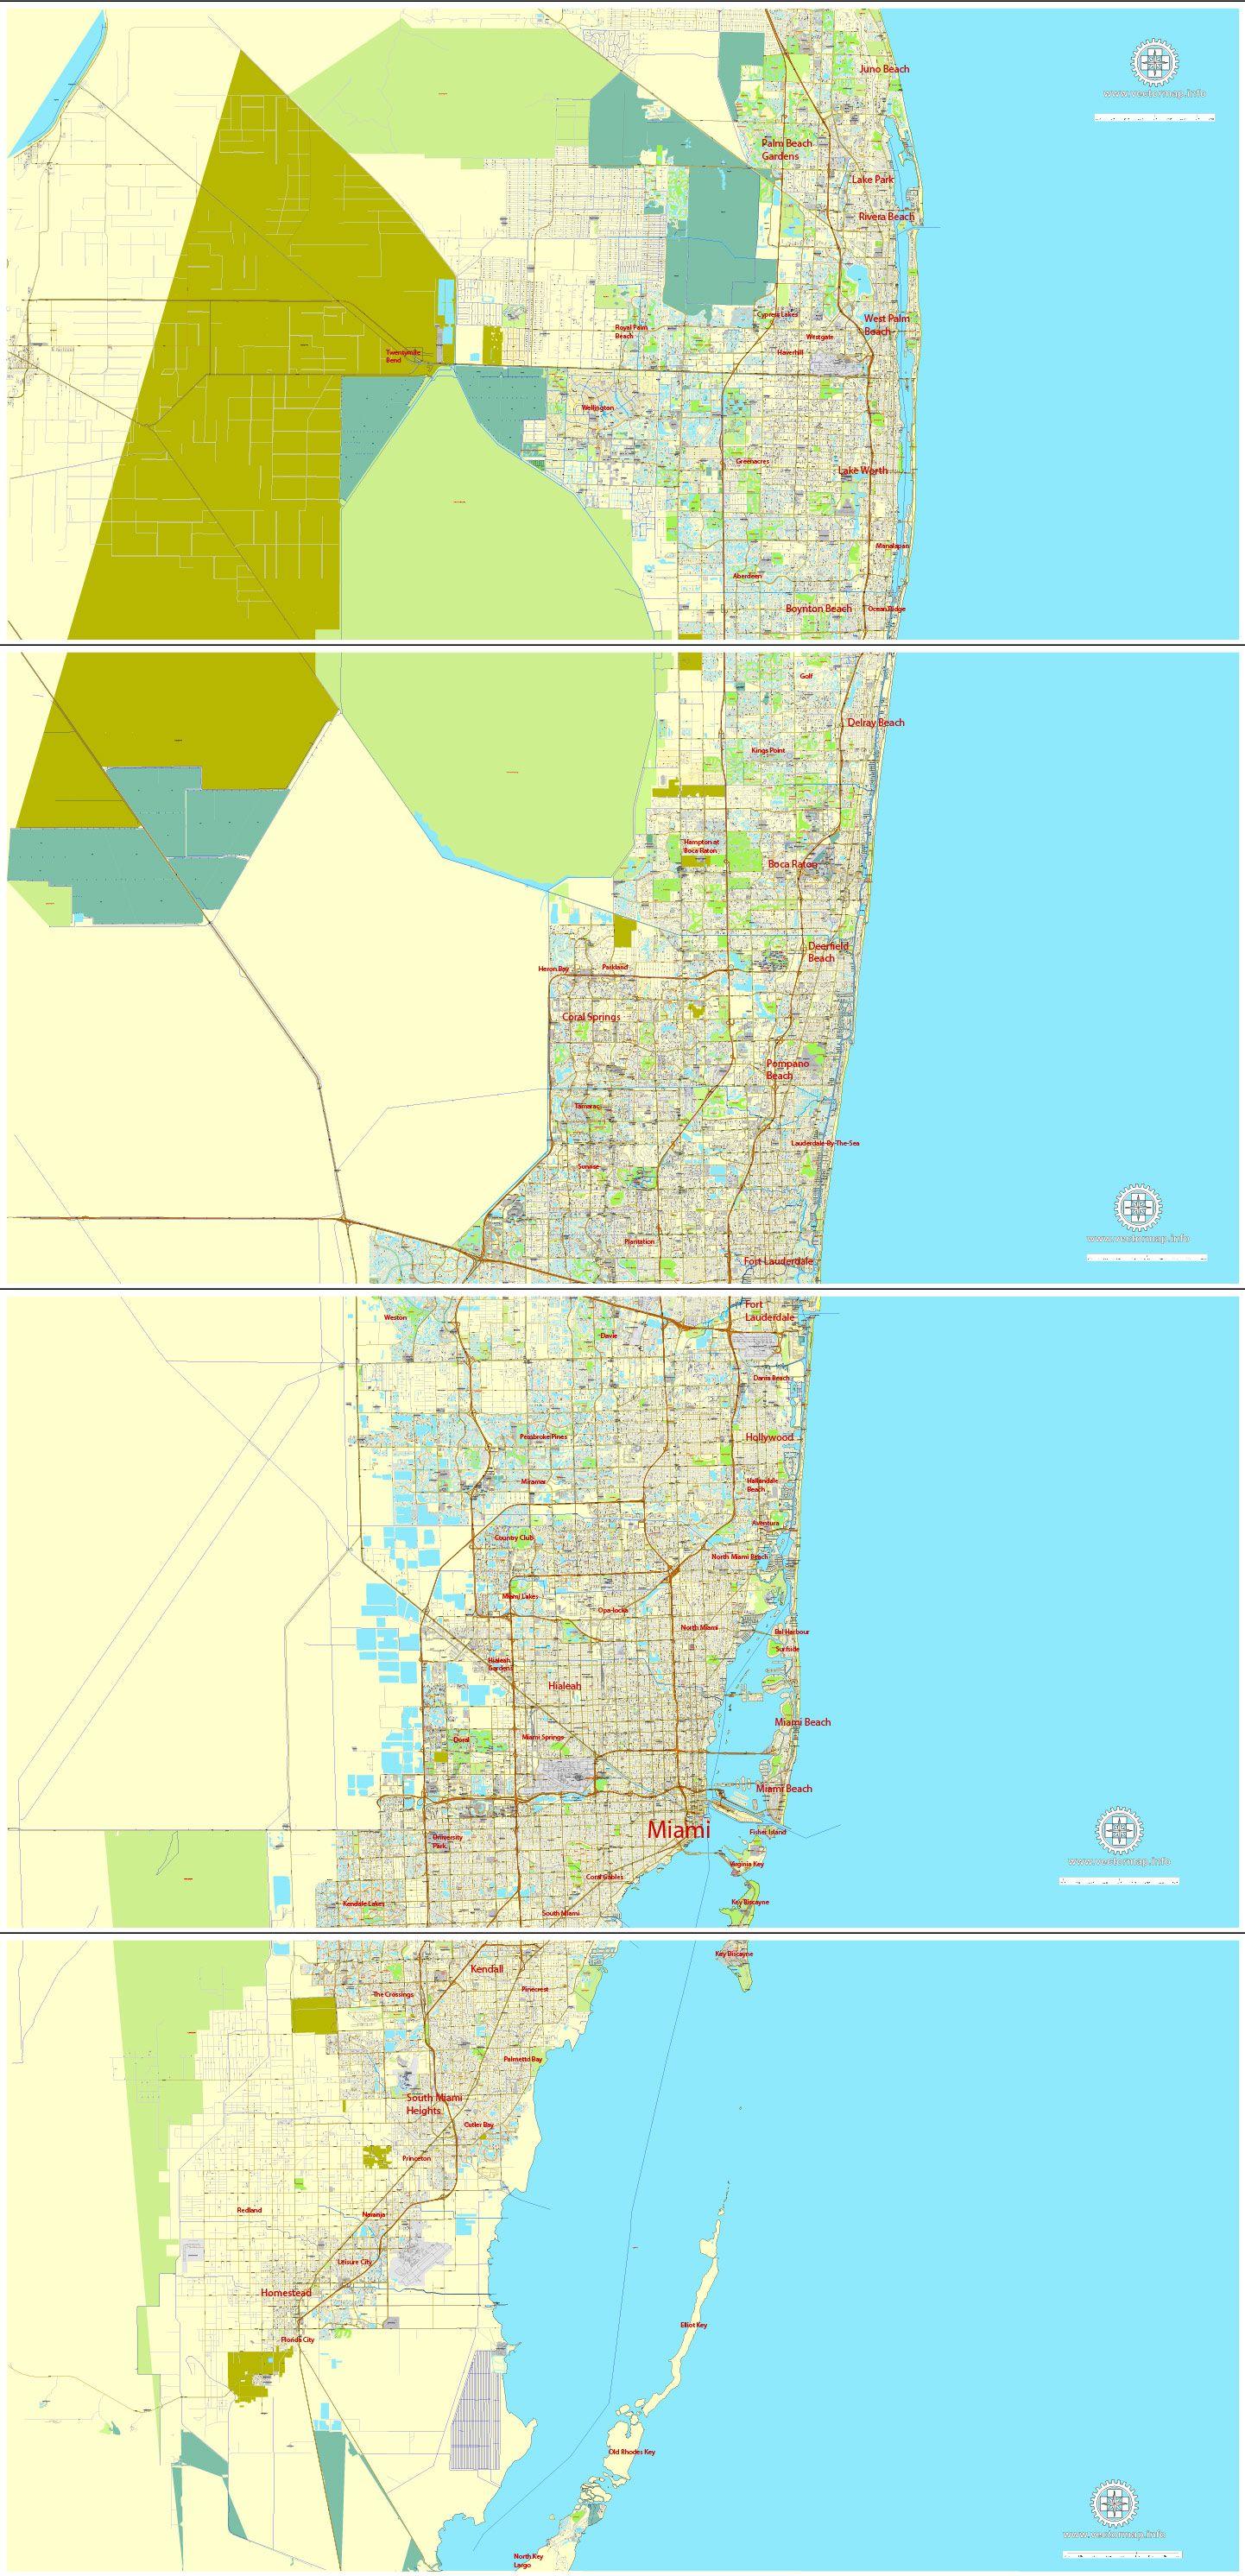 Map Florida City Names.Miami Pdf Map Florida Us Exact Vector City Plan Map In 4 Parts